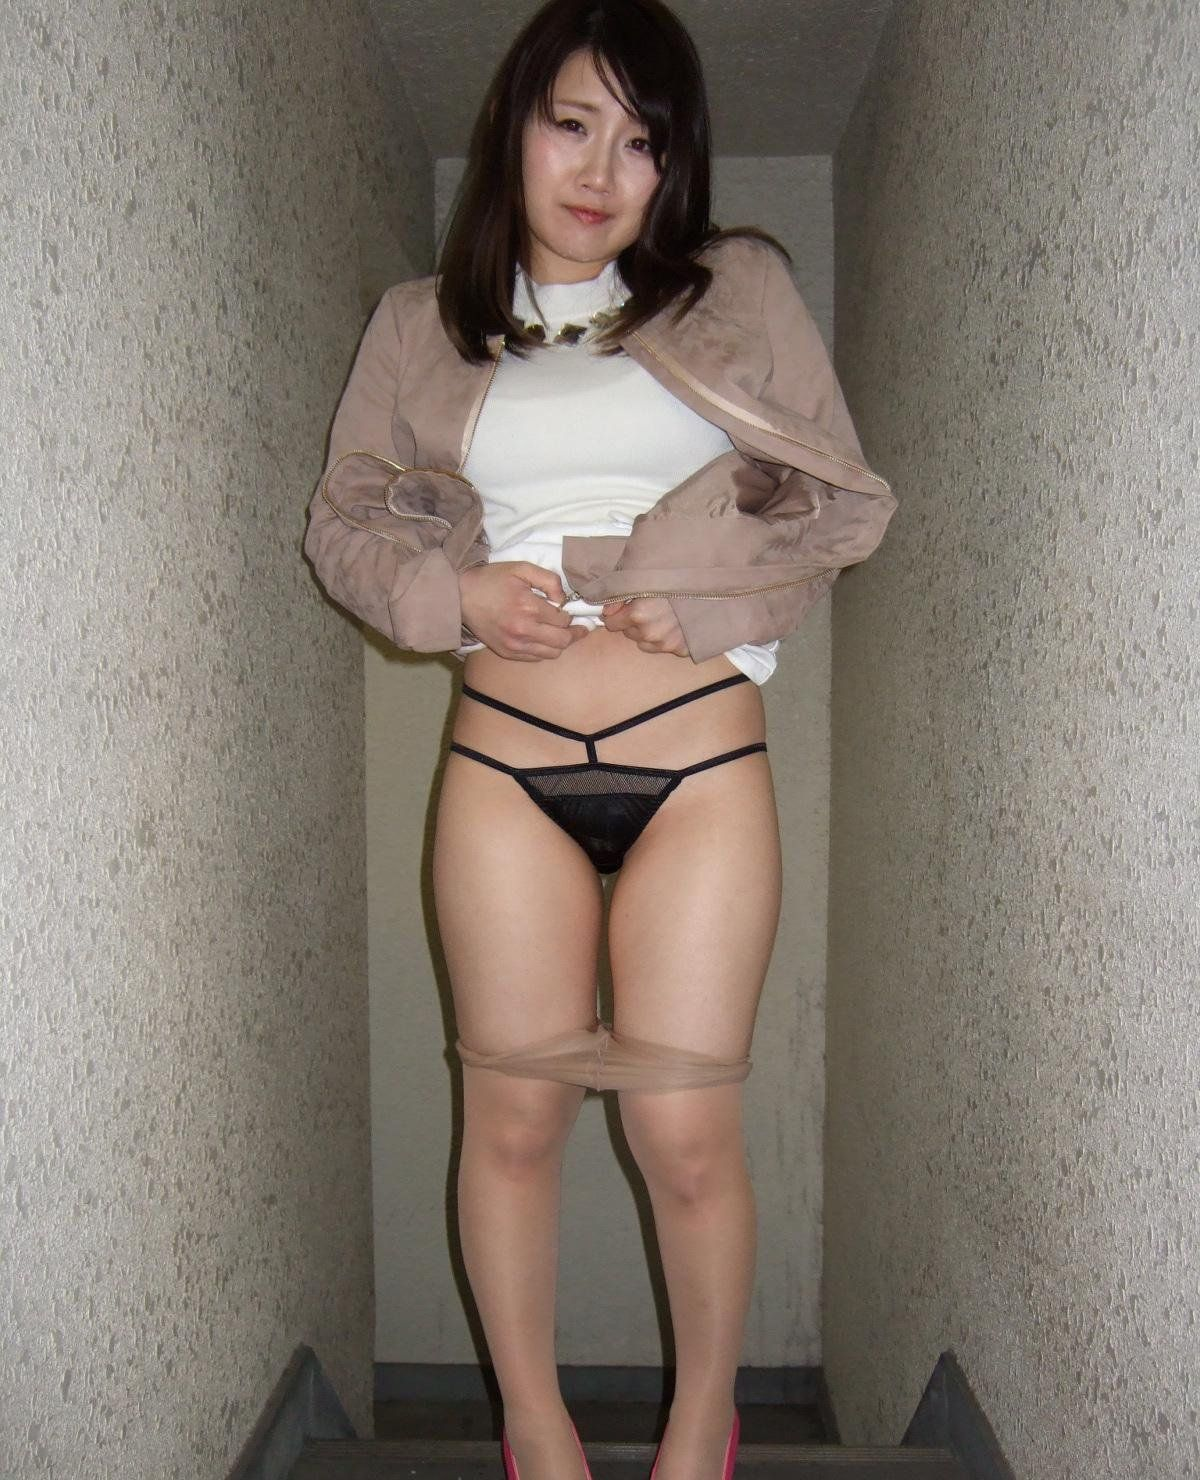 素人投稿 露出 amateur imagez | Japanese Milf | 素人投稿、投稿、女子高生